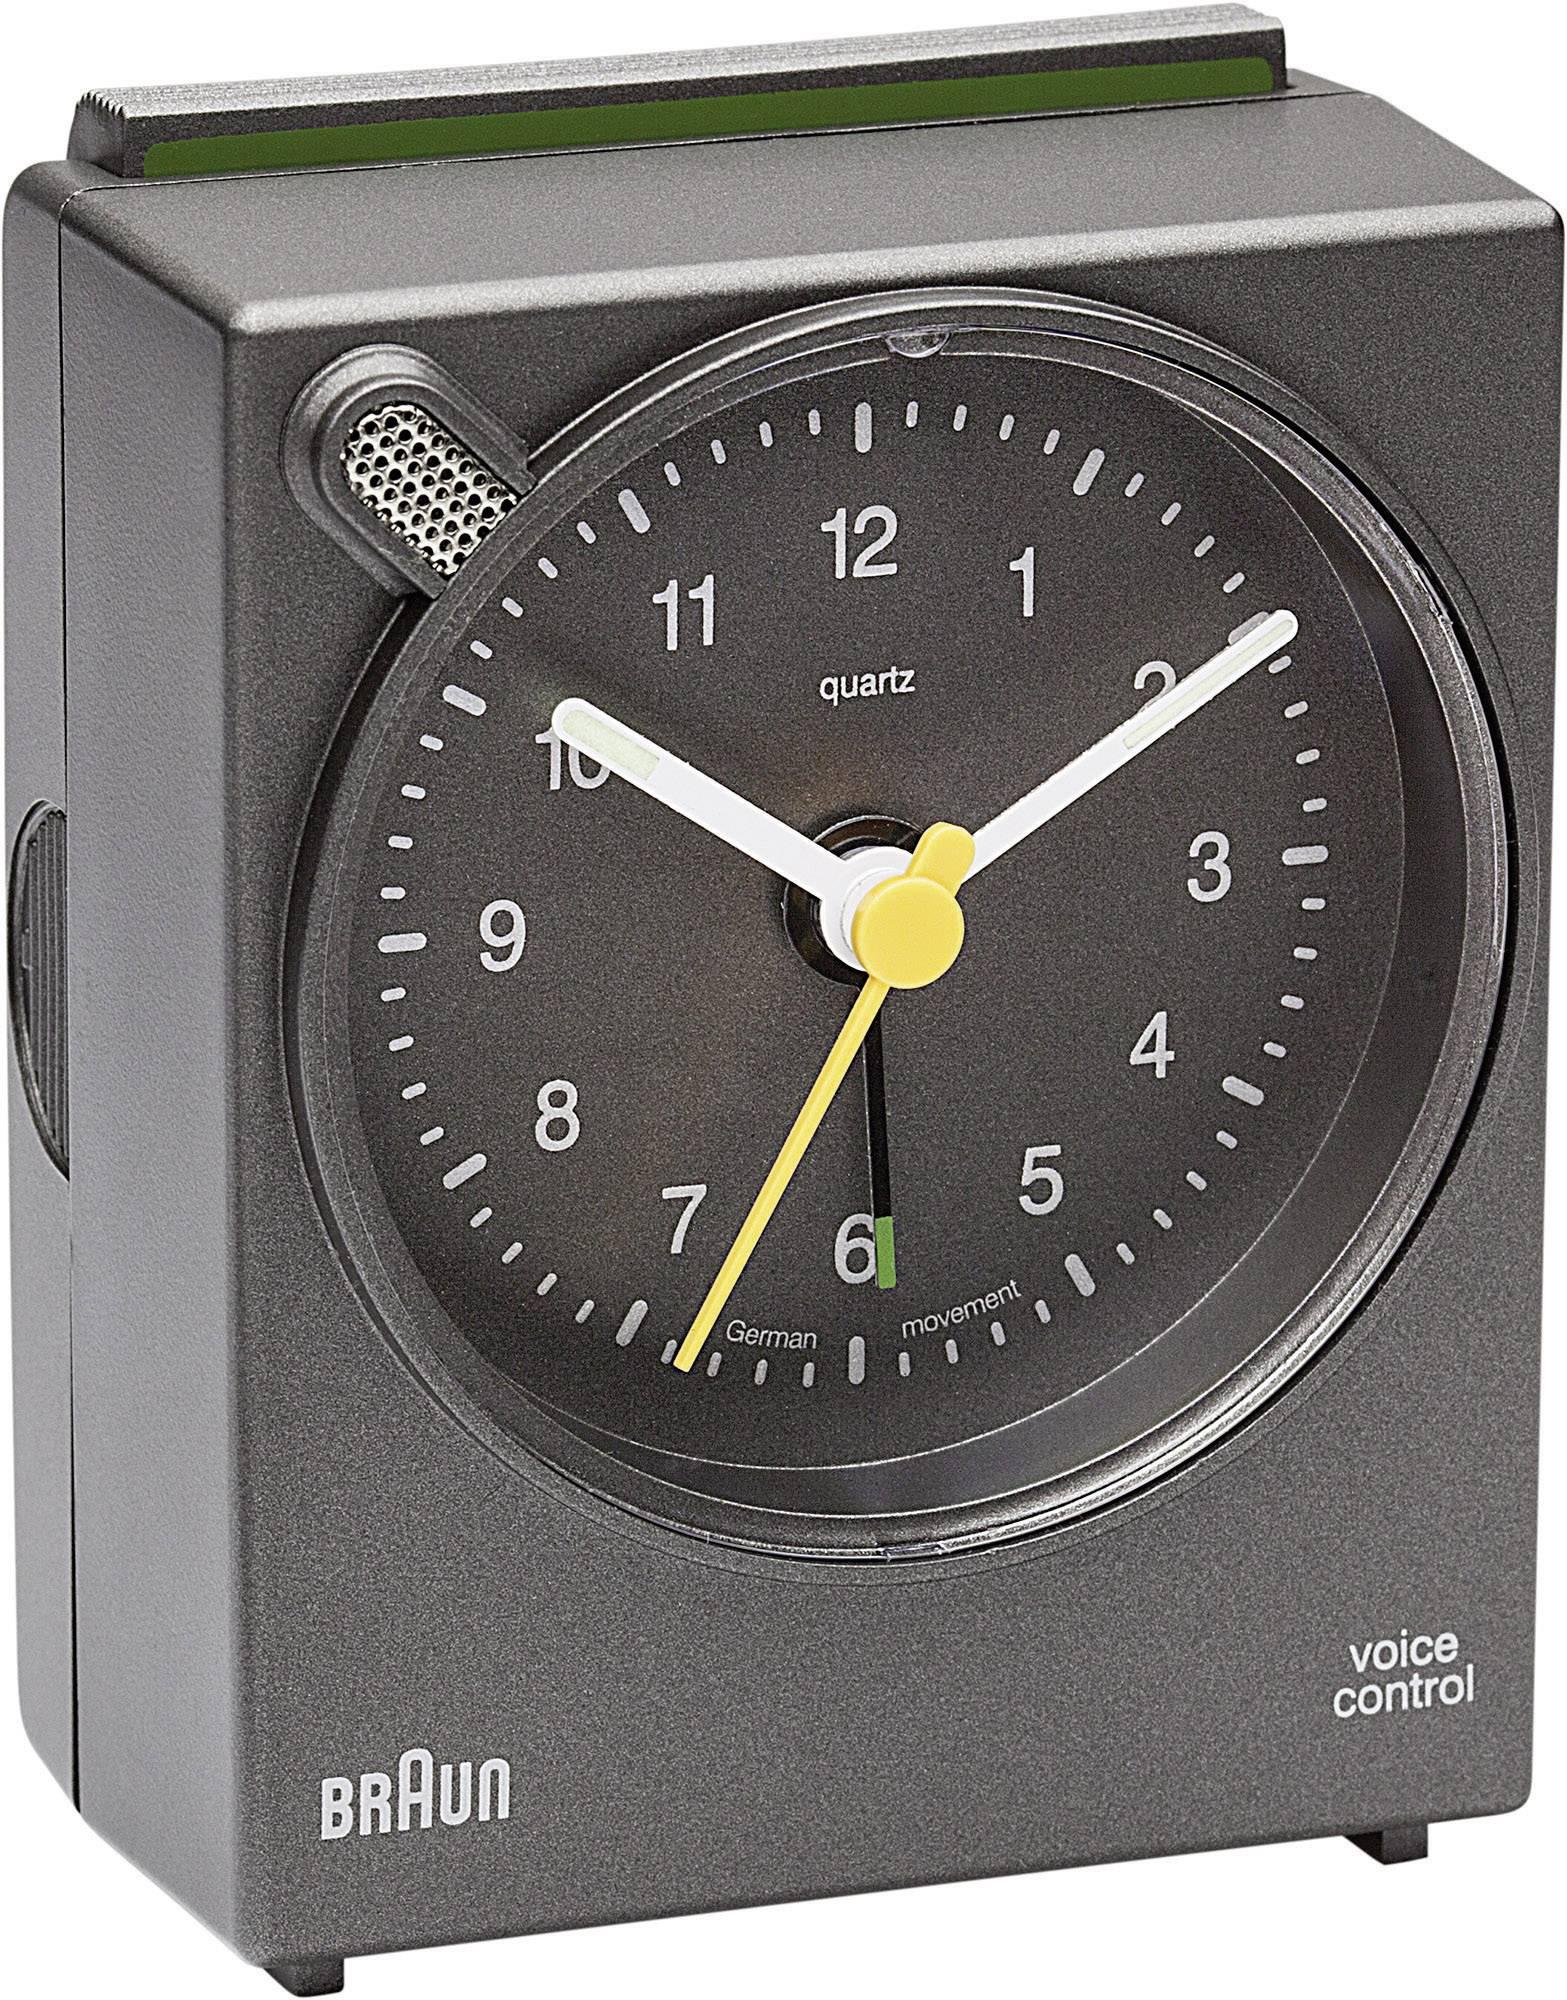 Analogový budík Braun Voice Control, 80 x 63 x 38 mm, hnědá